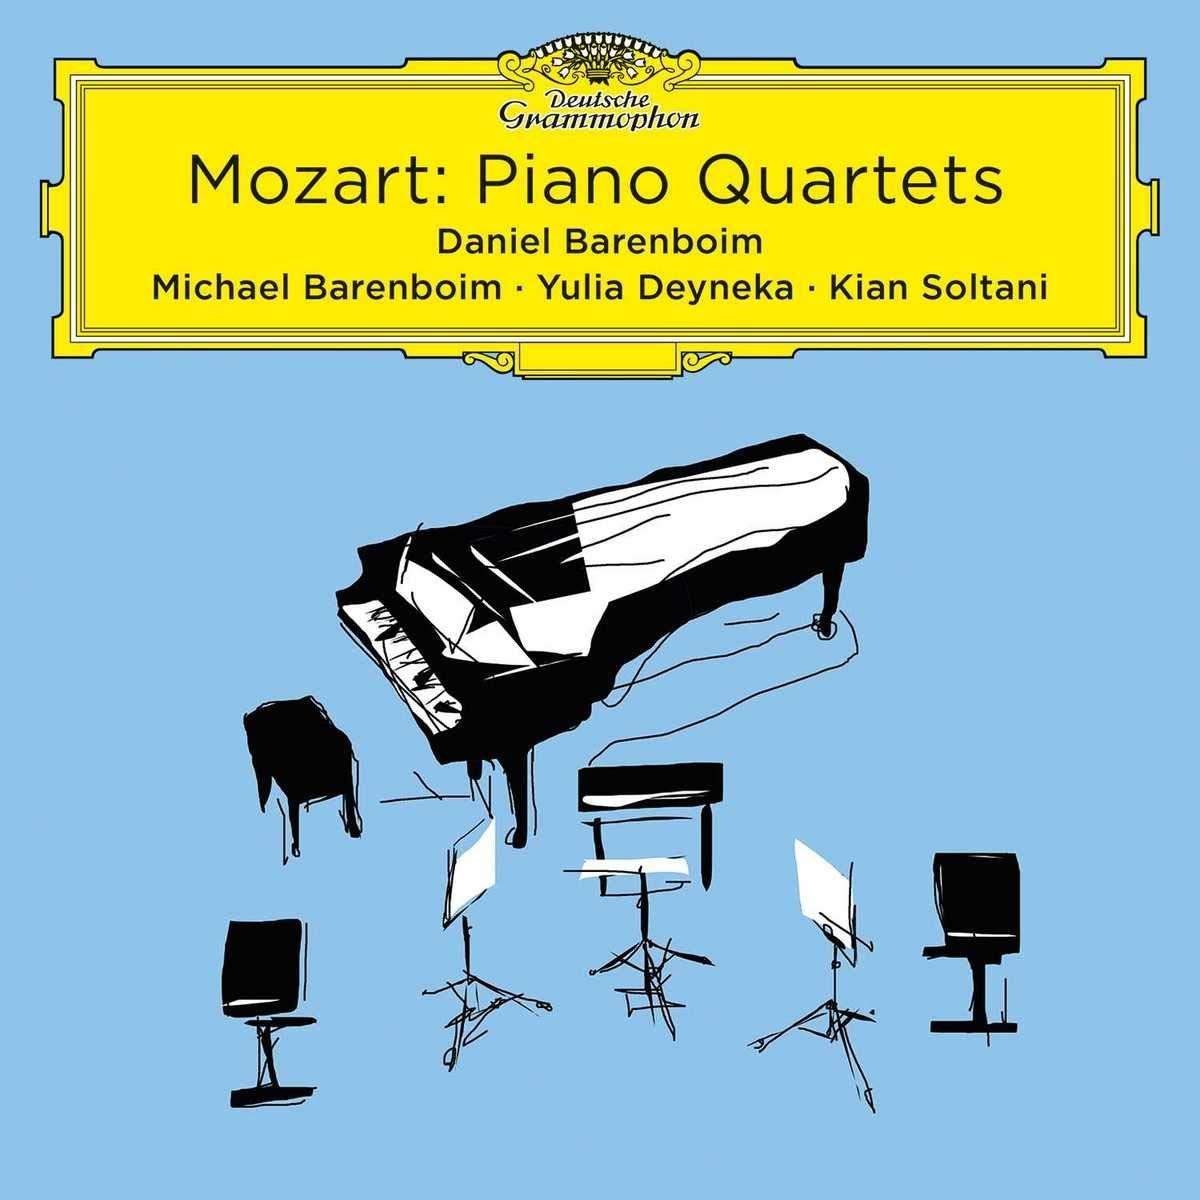 CD : DANIEL BARENBOIM/MICHAEL BARENBOIM/YIULIA DEYNEKA/KIAN SO - Piano Quartets